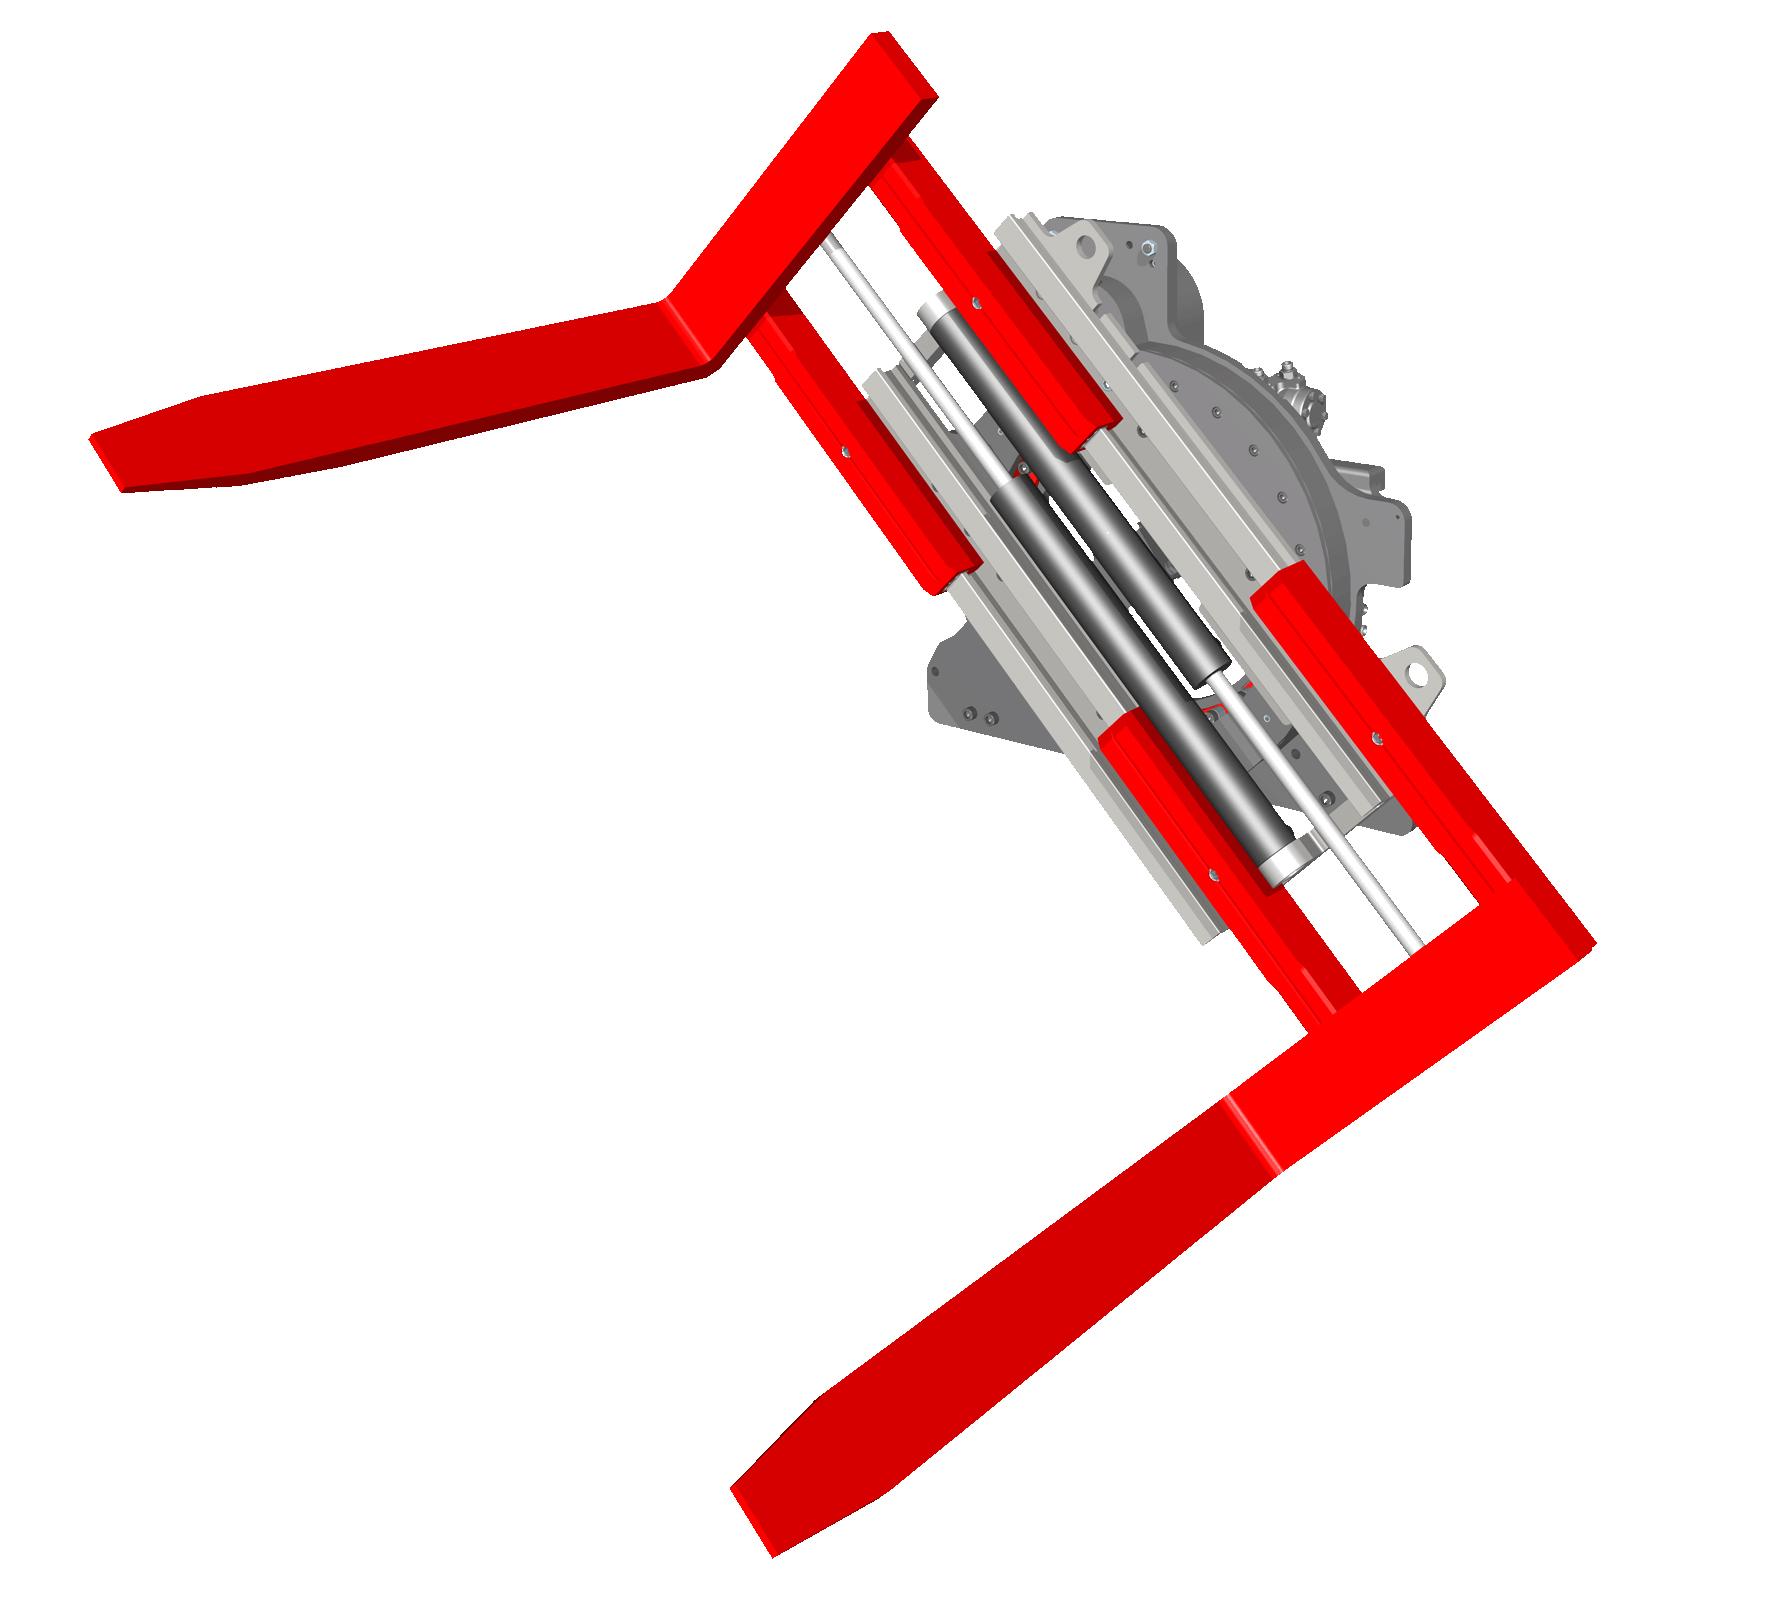 Sisteme cu rotire (furci cu clamp, clampuri, cupe etc.) KAUP - Poza 1